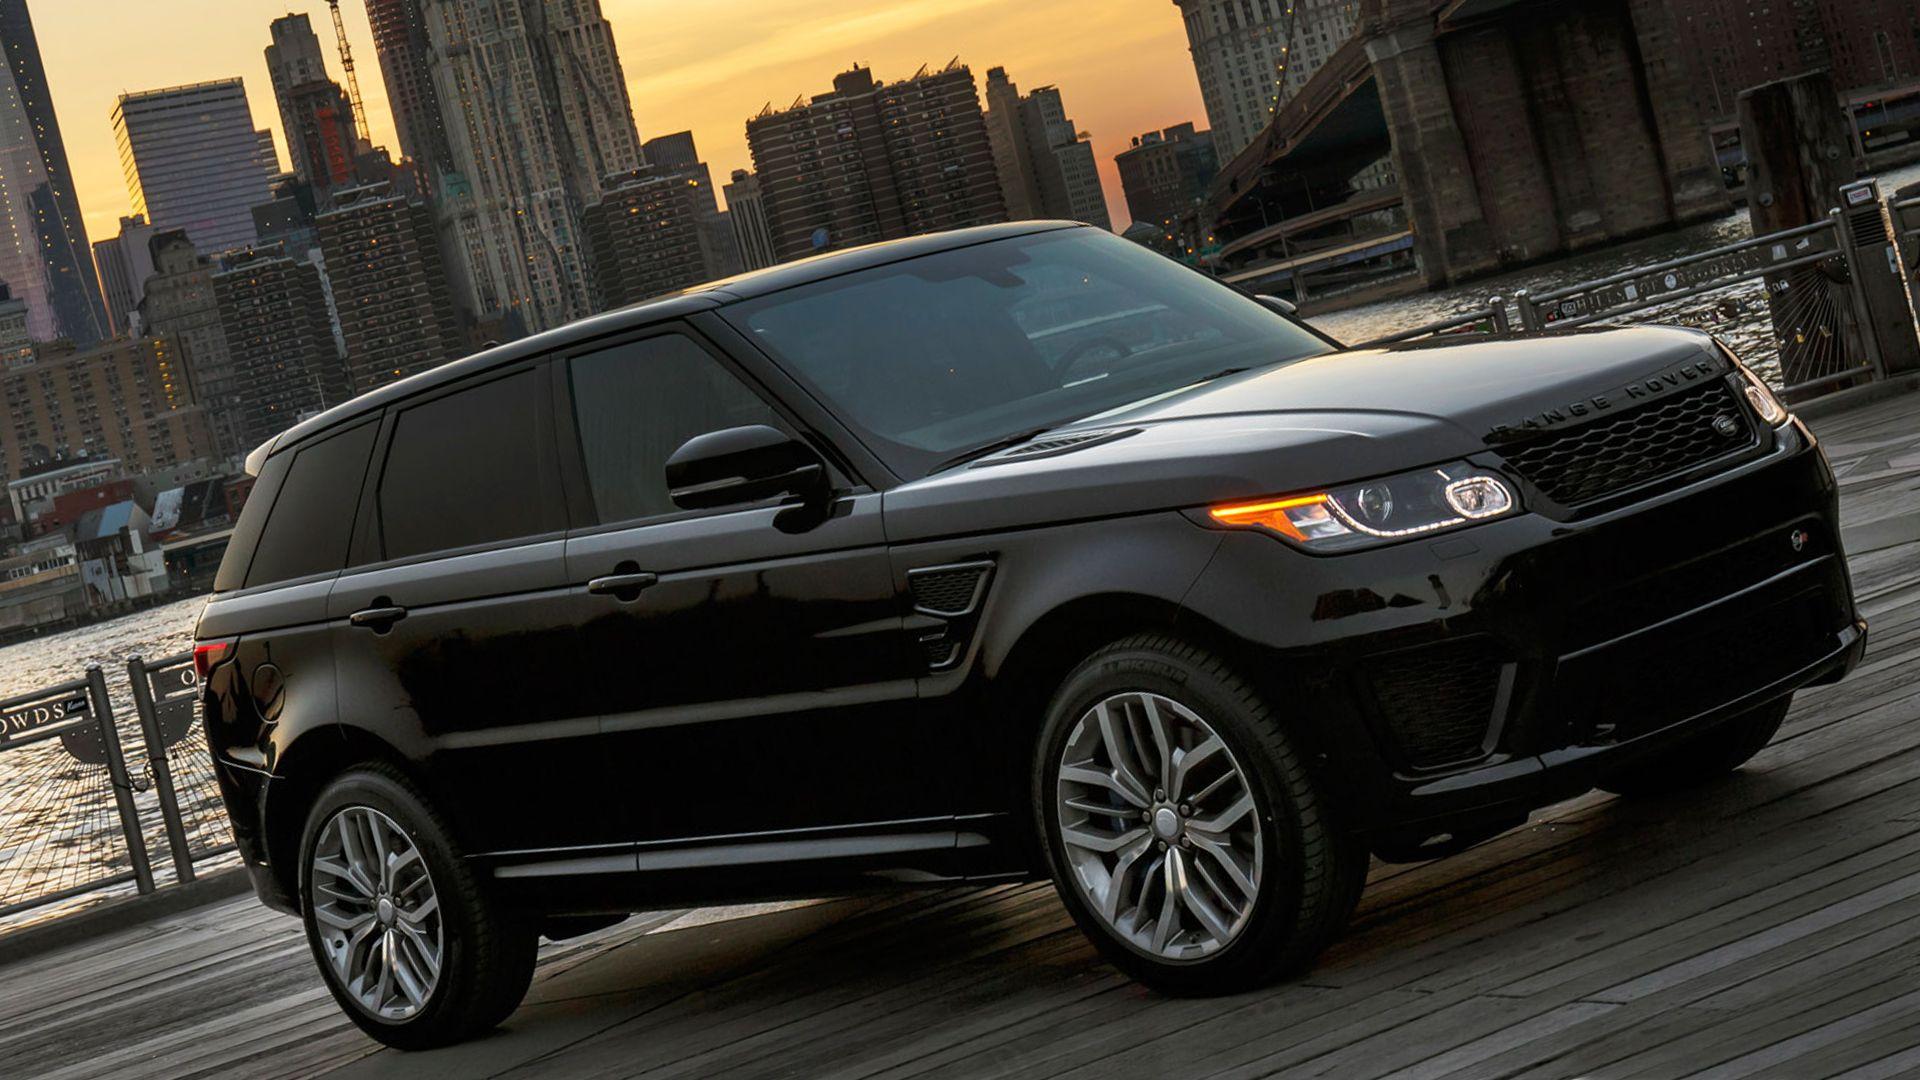 2019 Range Rover Sport Exterior Changes Range rover